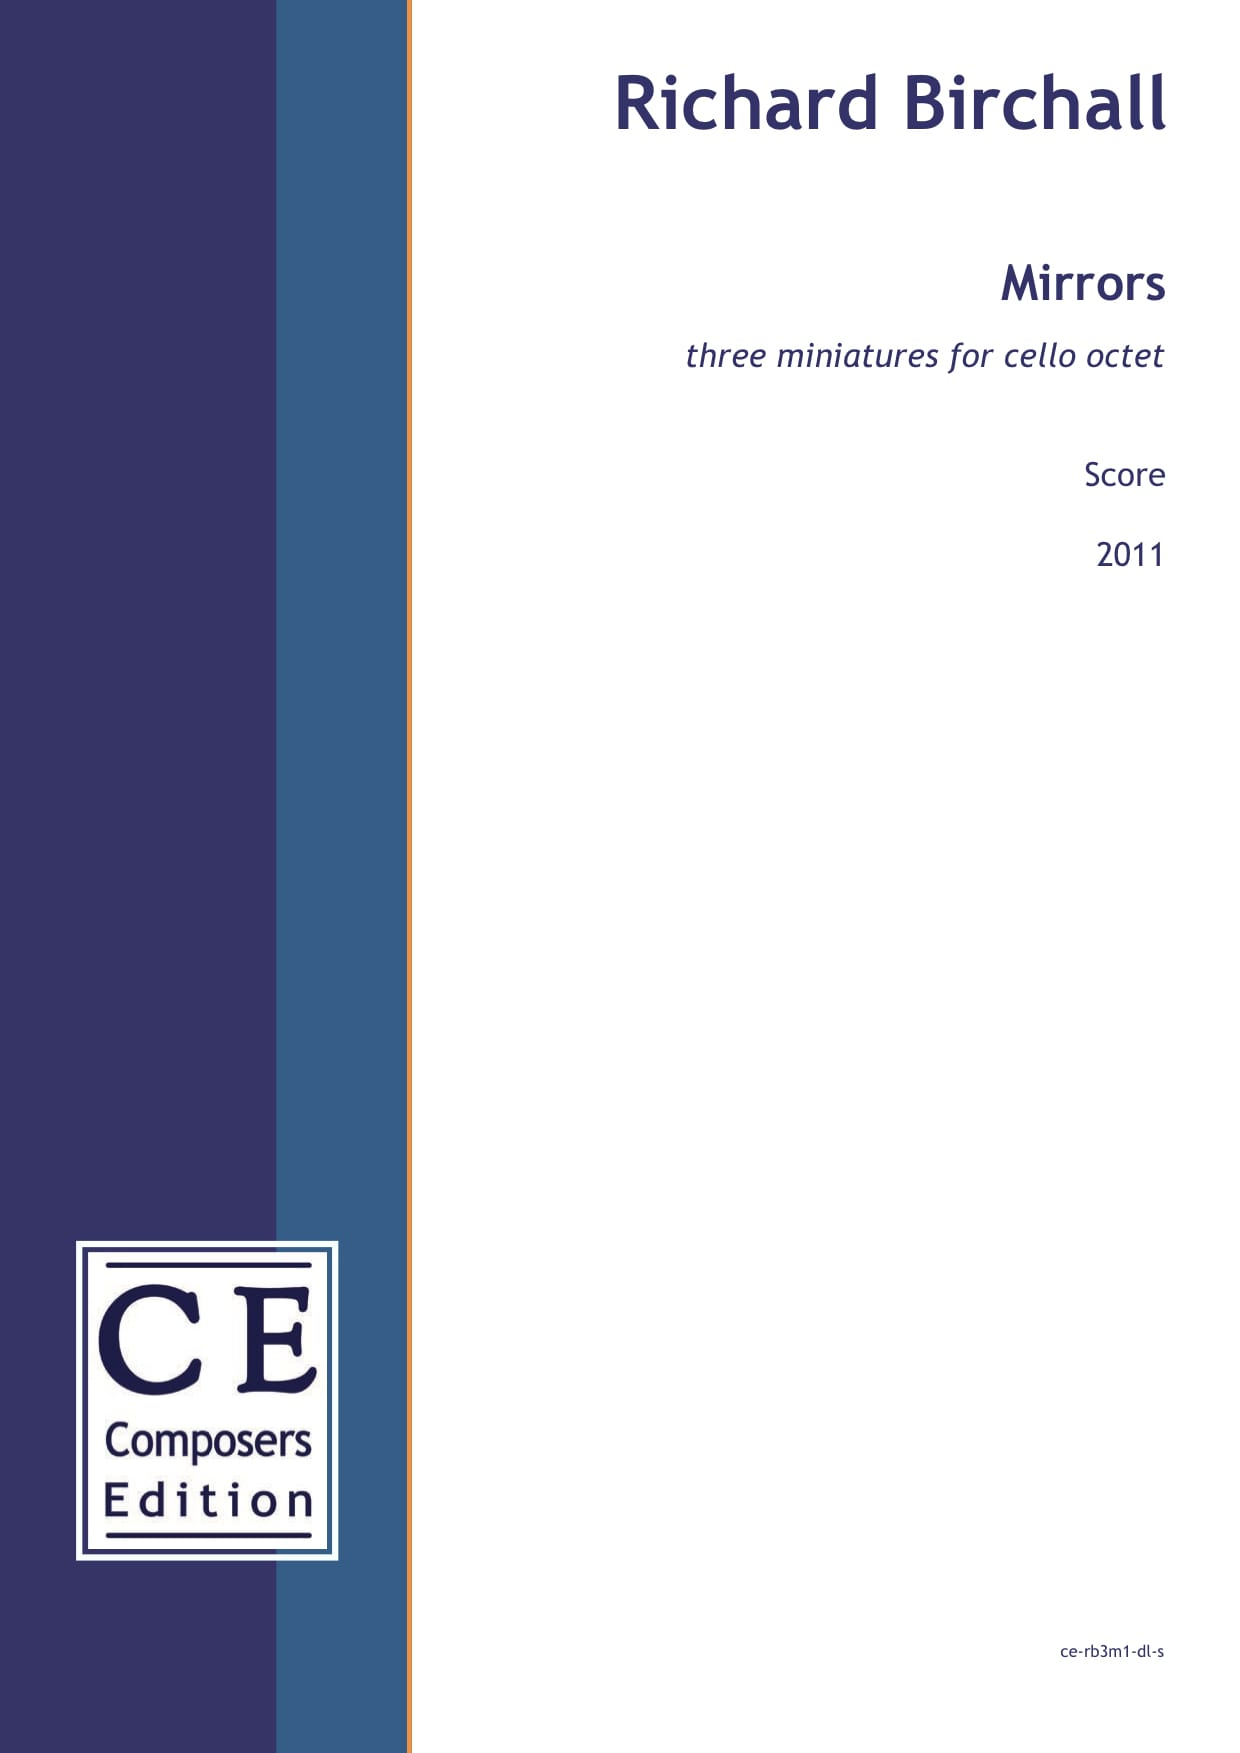 Richard Birchall: Mirrors three miniatures for cello octet